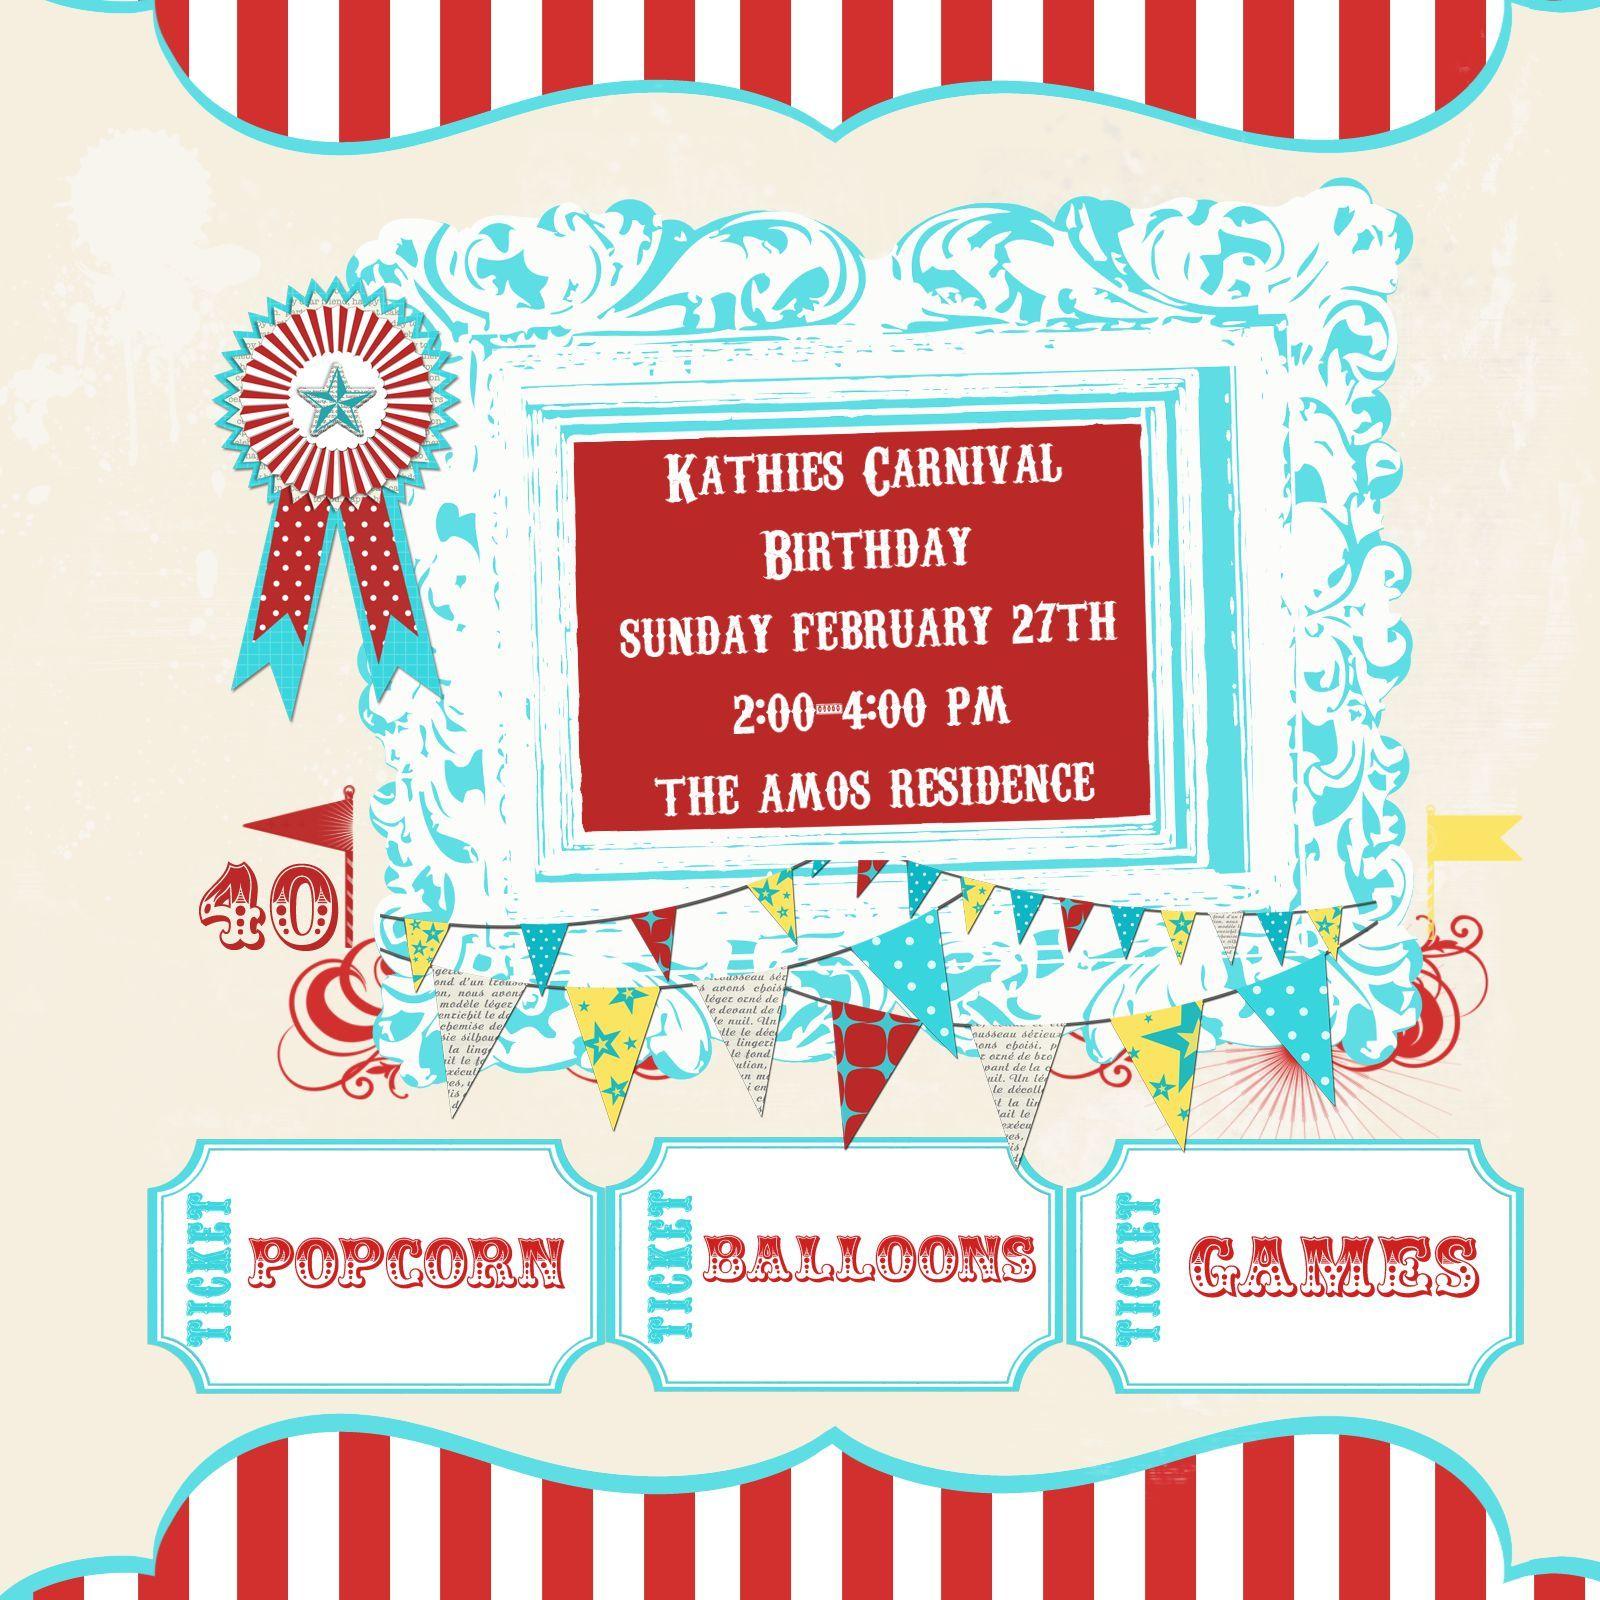 handmade-birthday-invitation-cards-ideas | birthday invitation ...